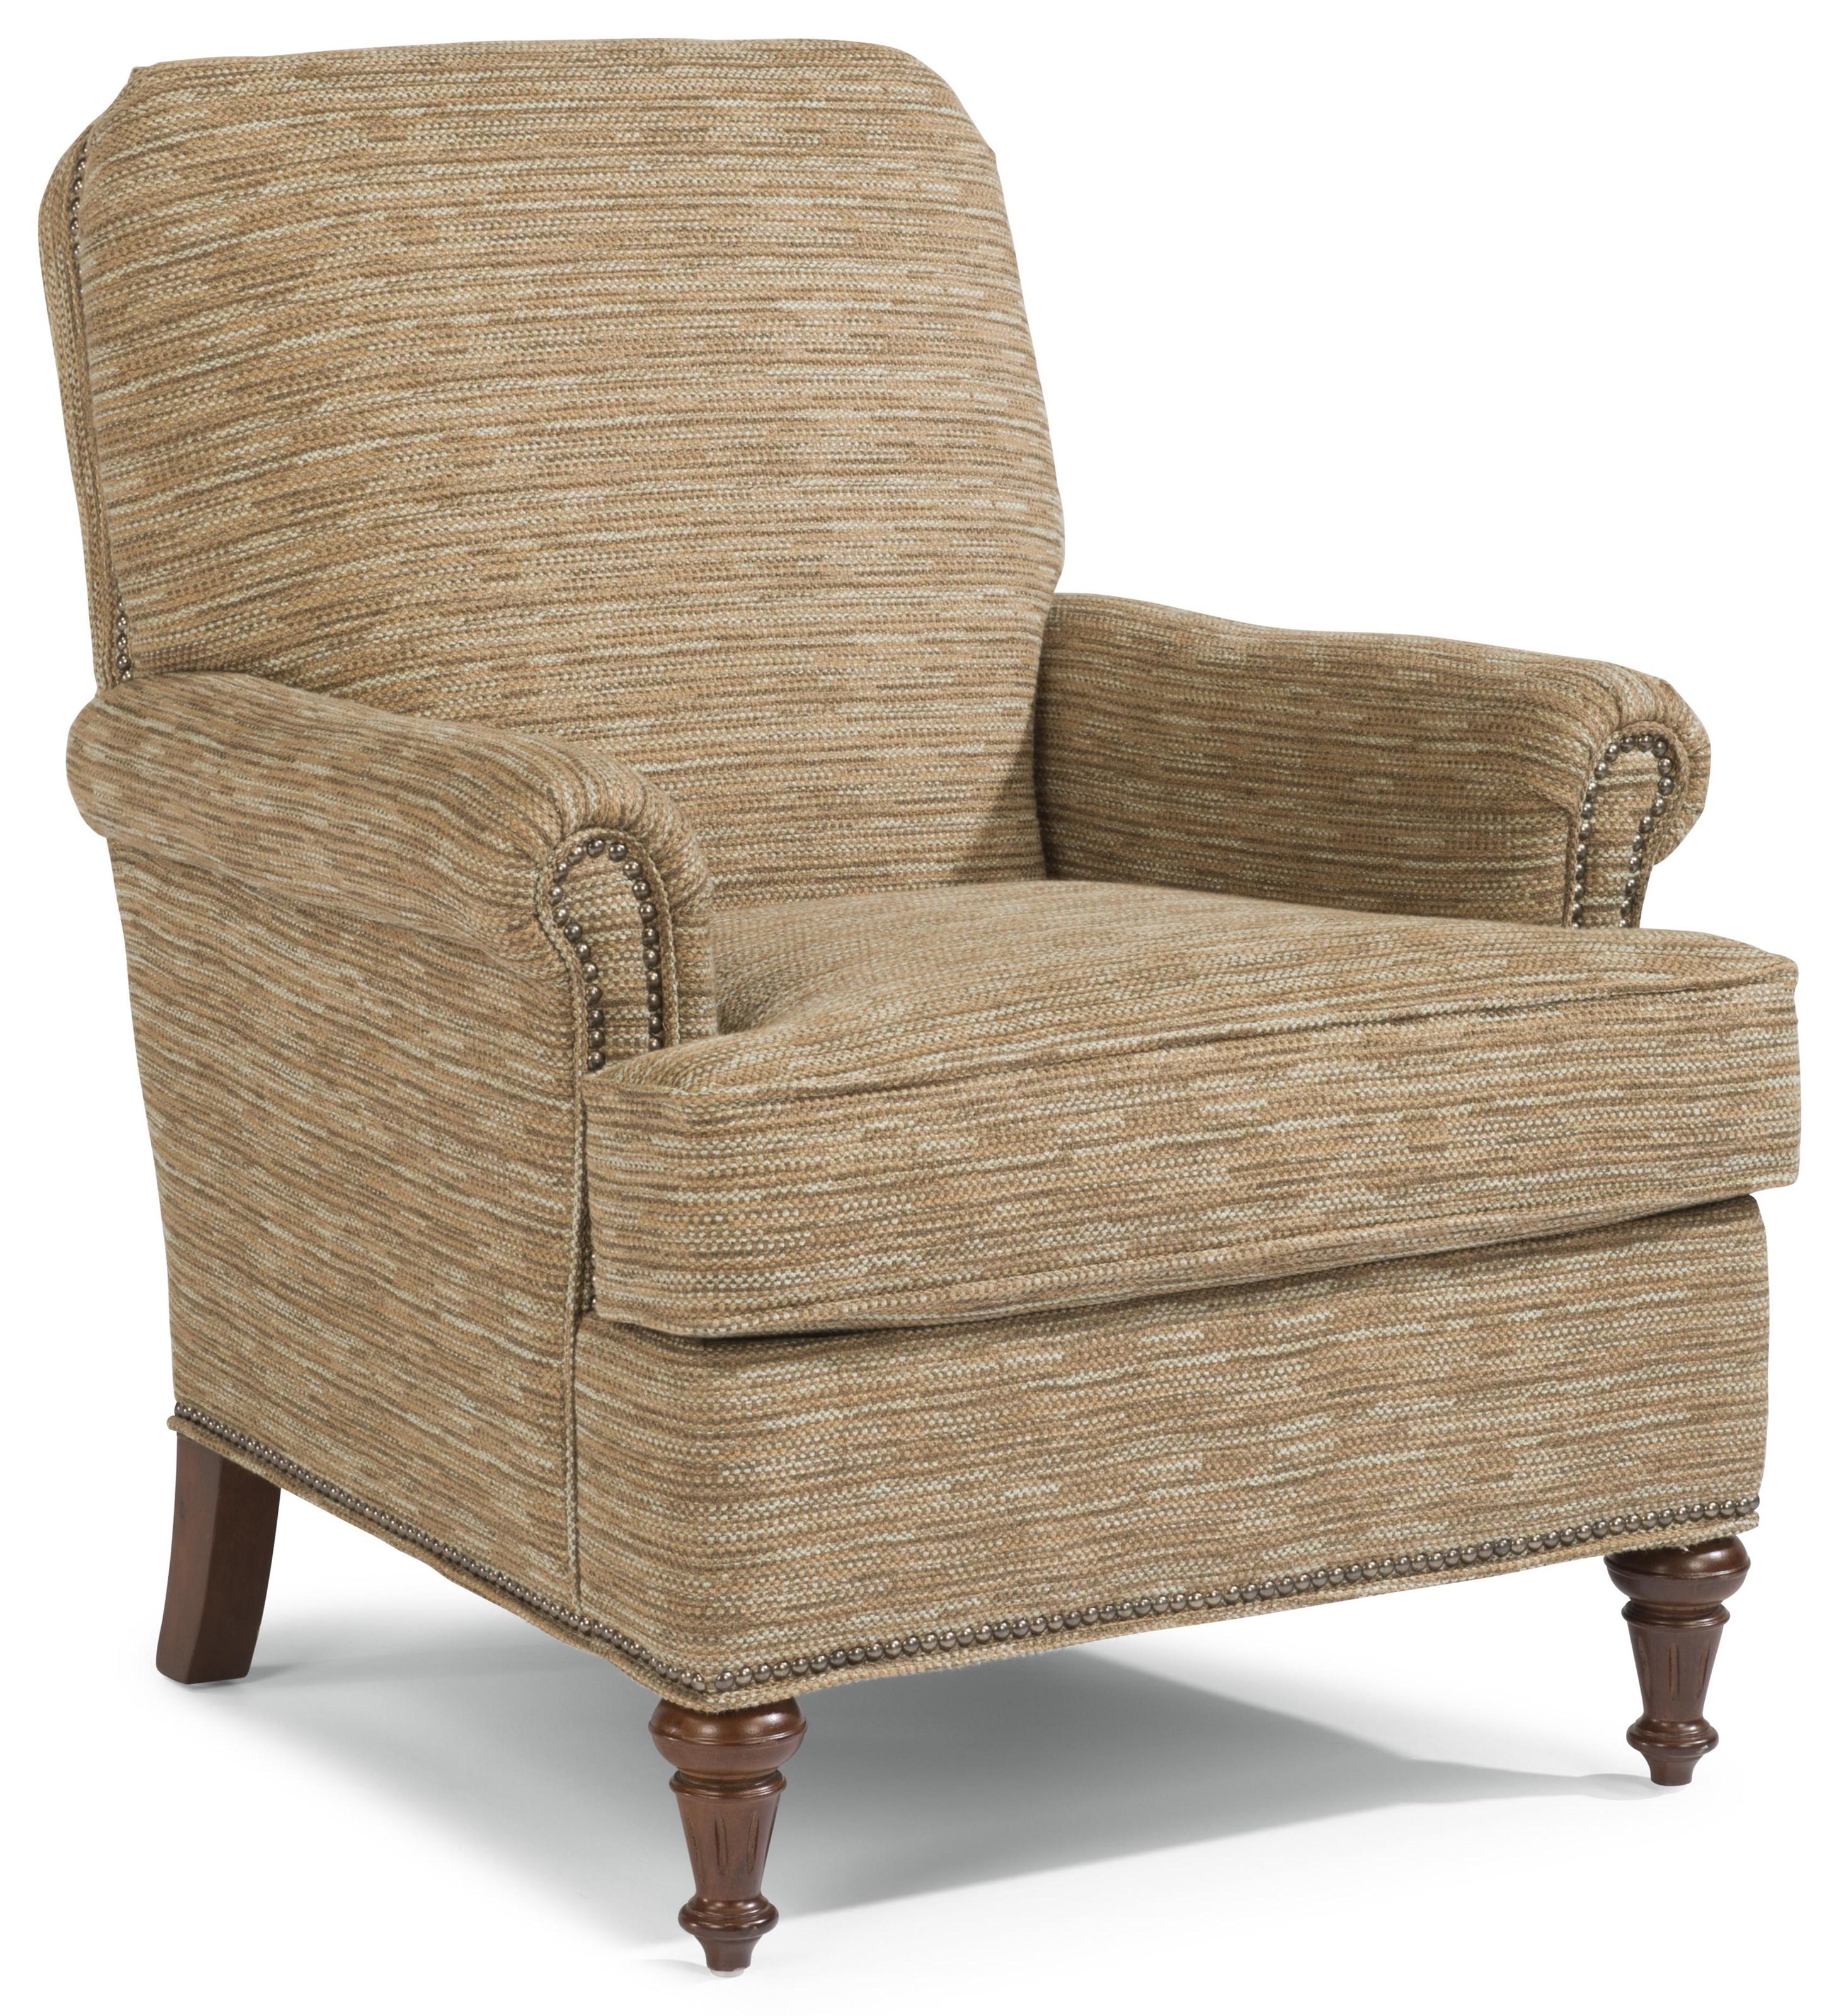 Penn Chair by Flexsteel at Crowley Furniture & Mattress